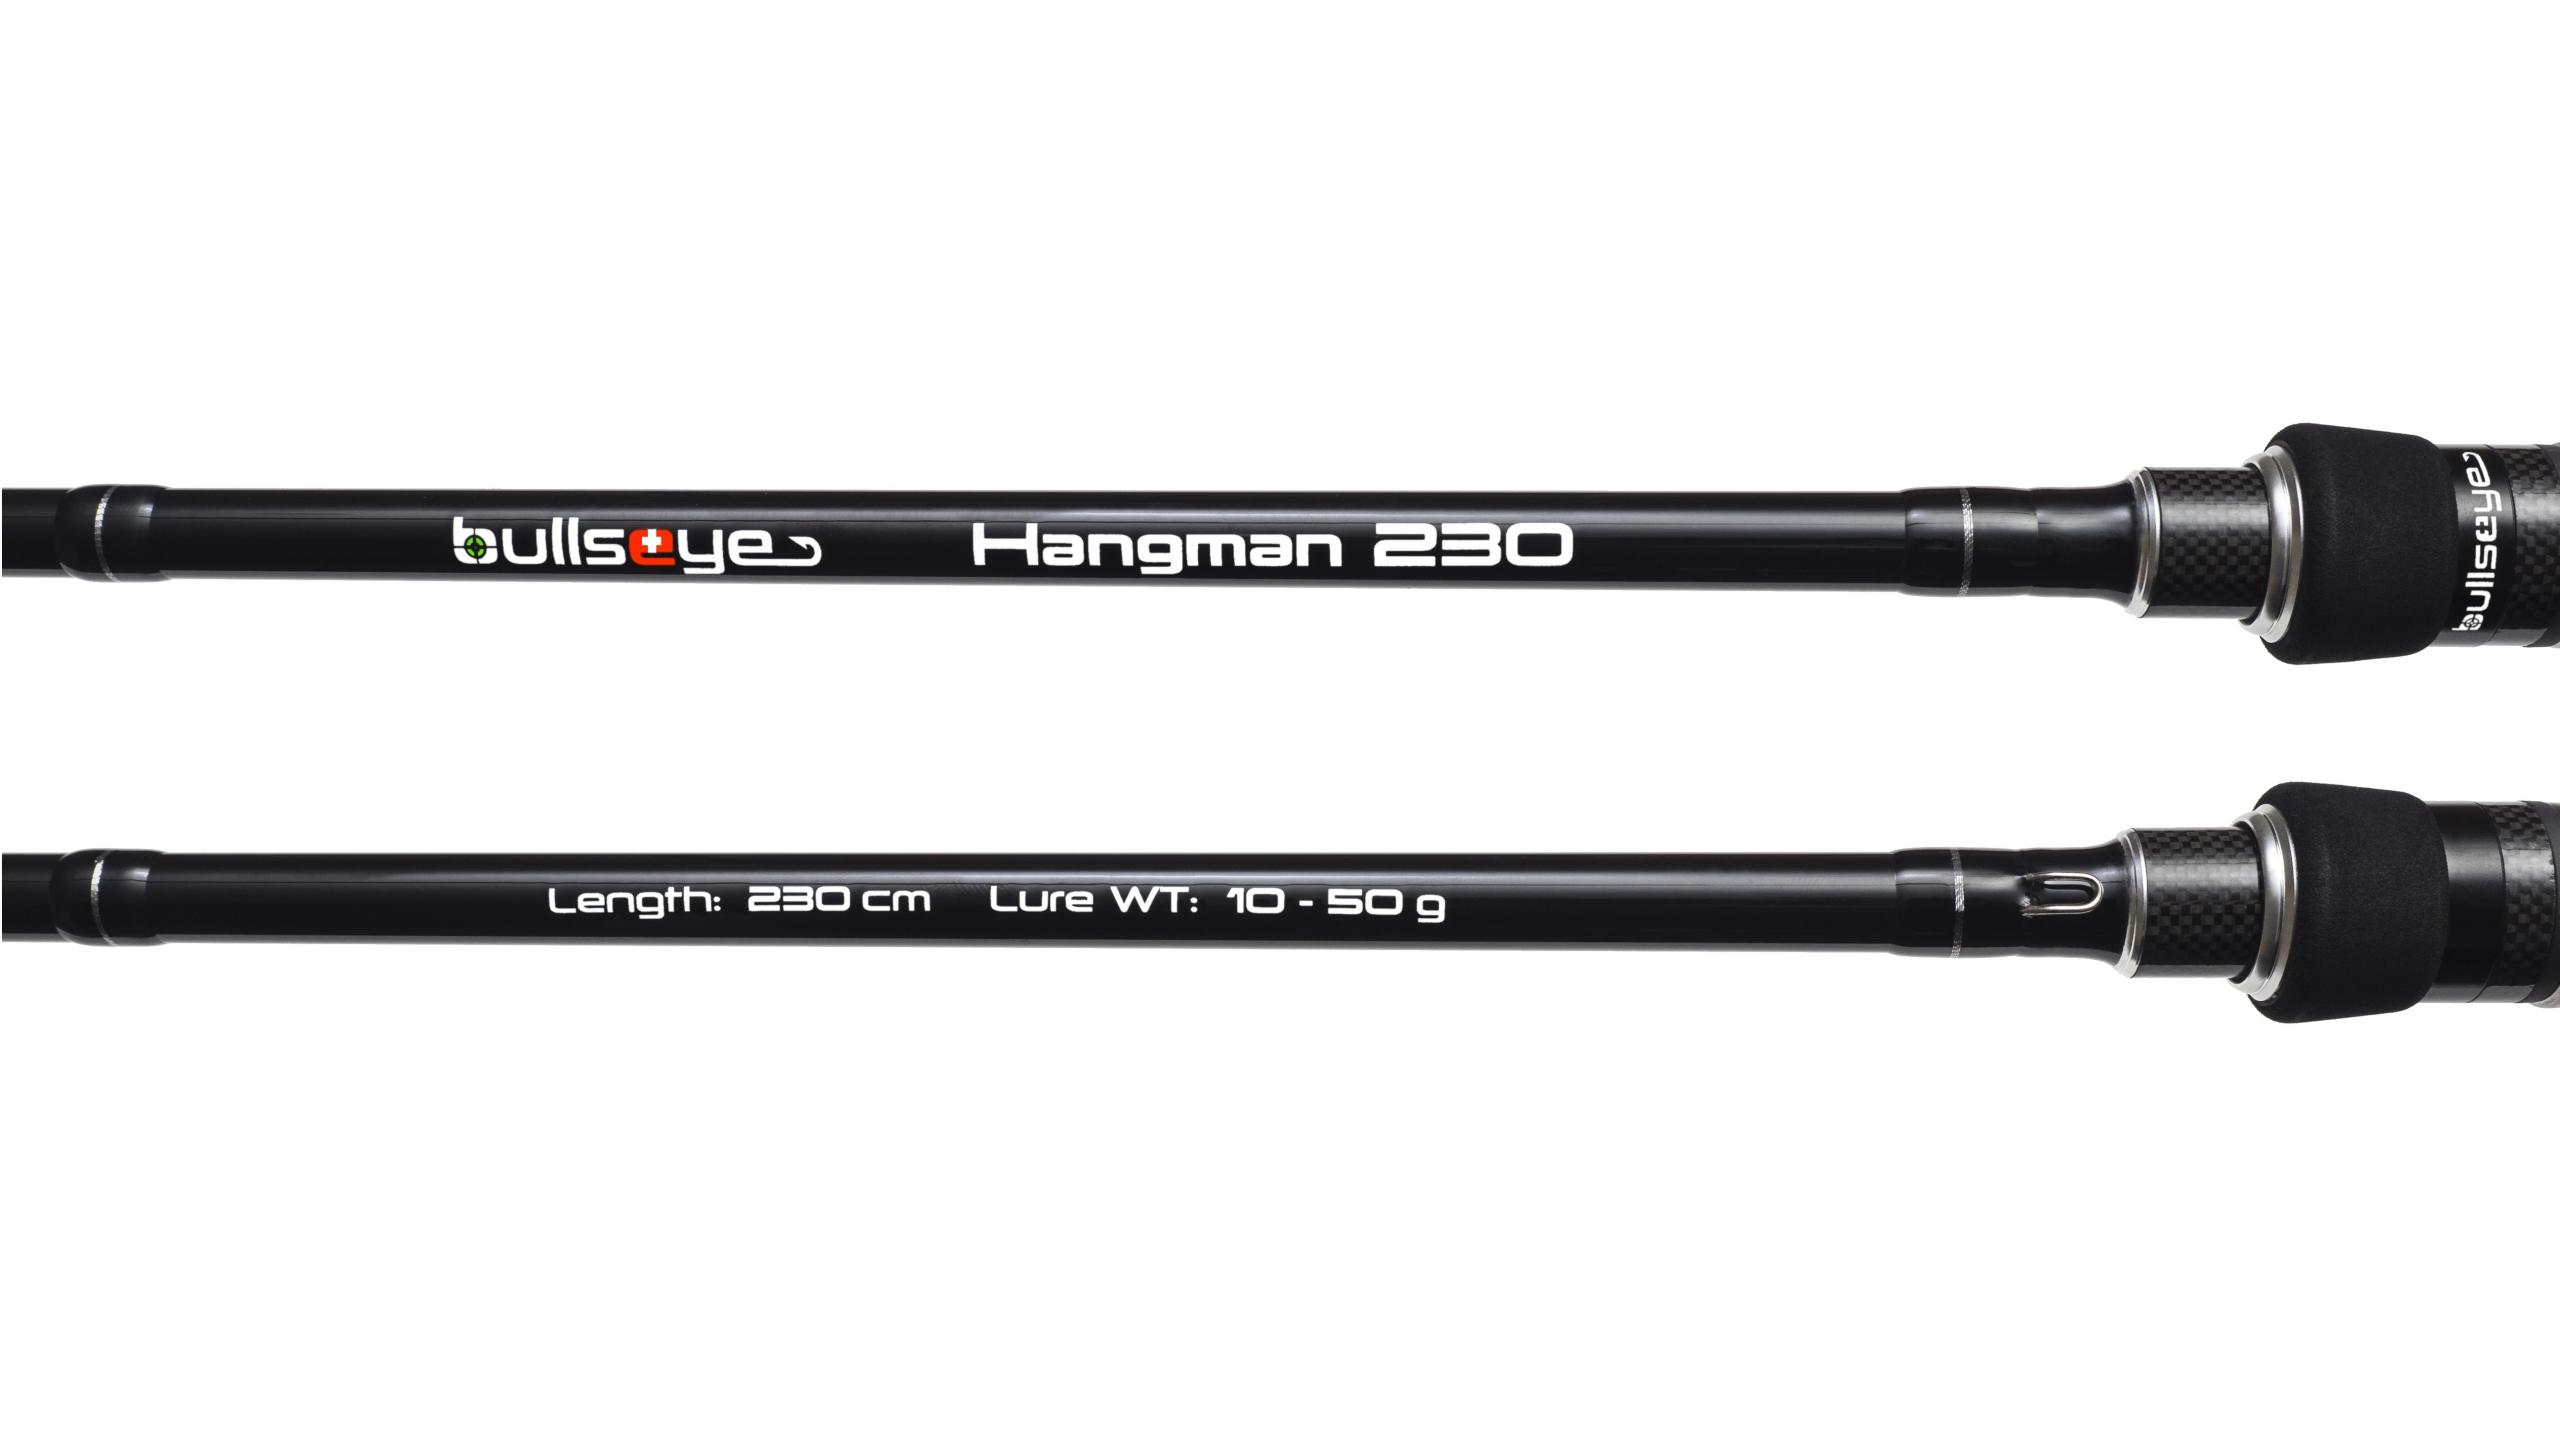 Hangman 230 10-50g